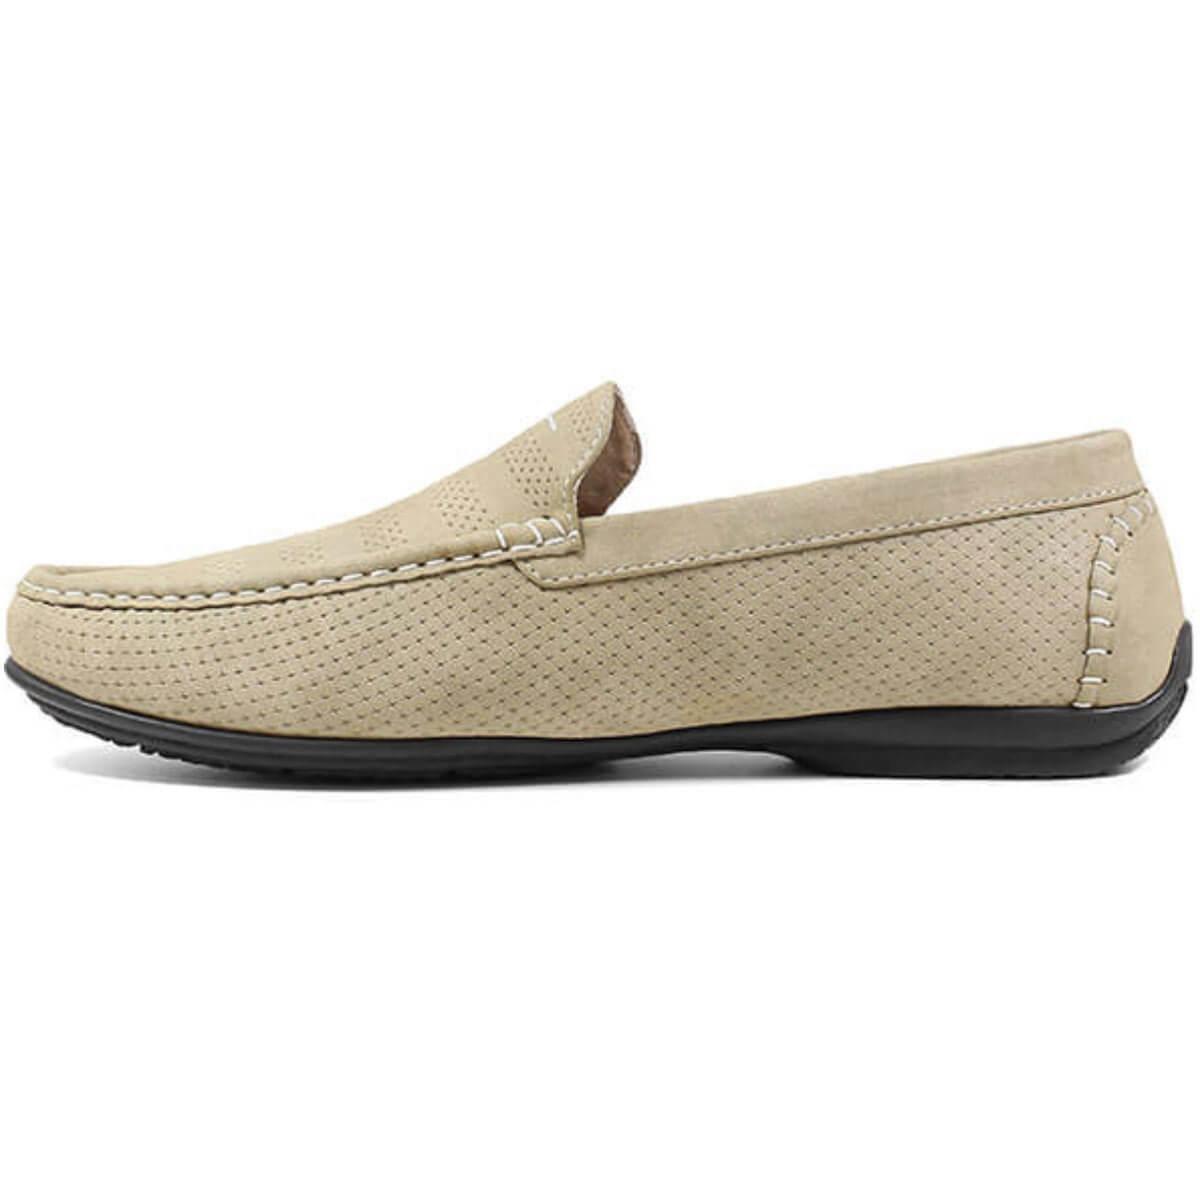 Stacy Adams Men's Shoes Cirrus Stone, Moc Toe Slip On, 8.5M (25359-275-085M)